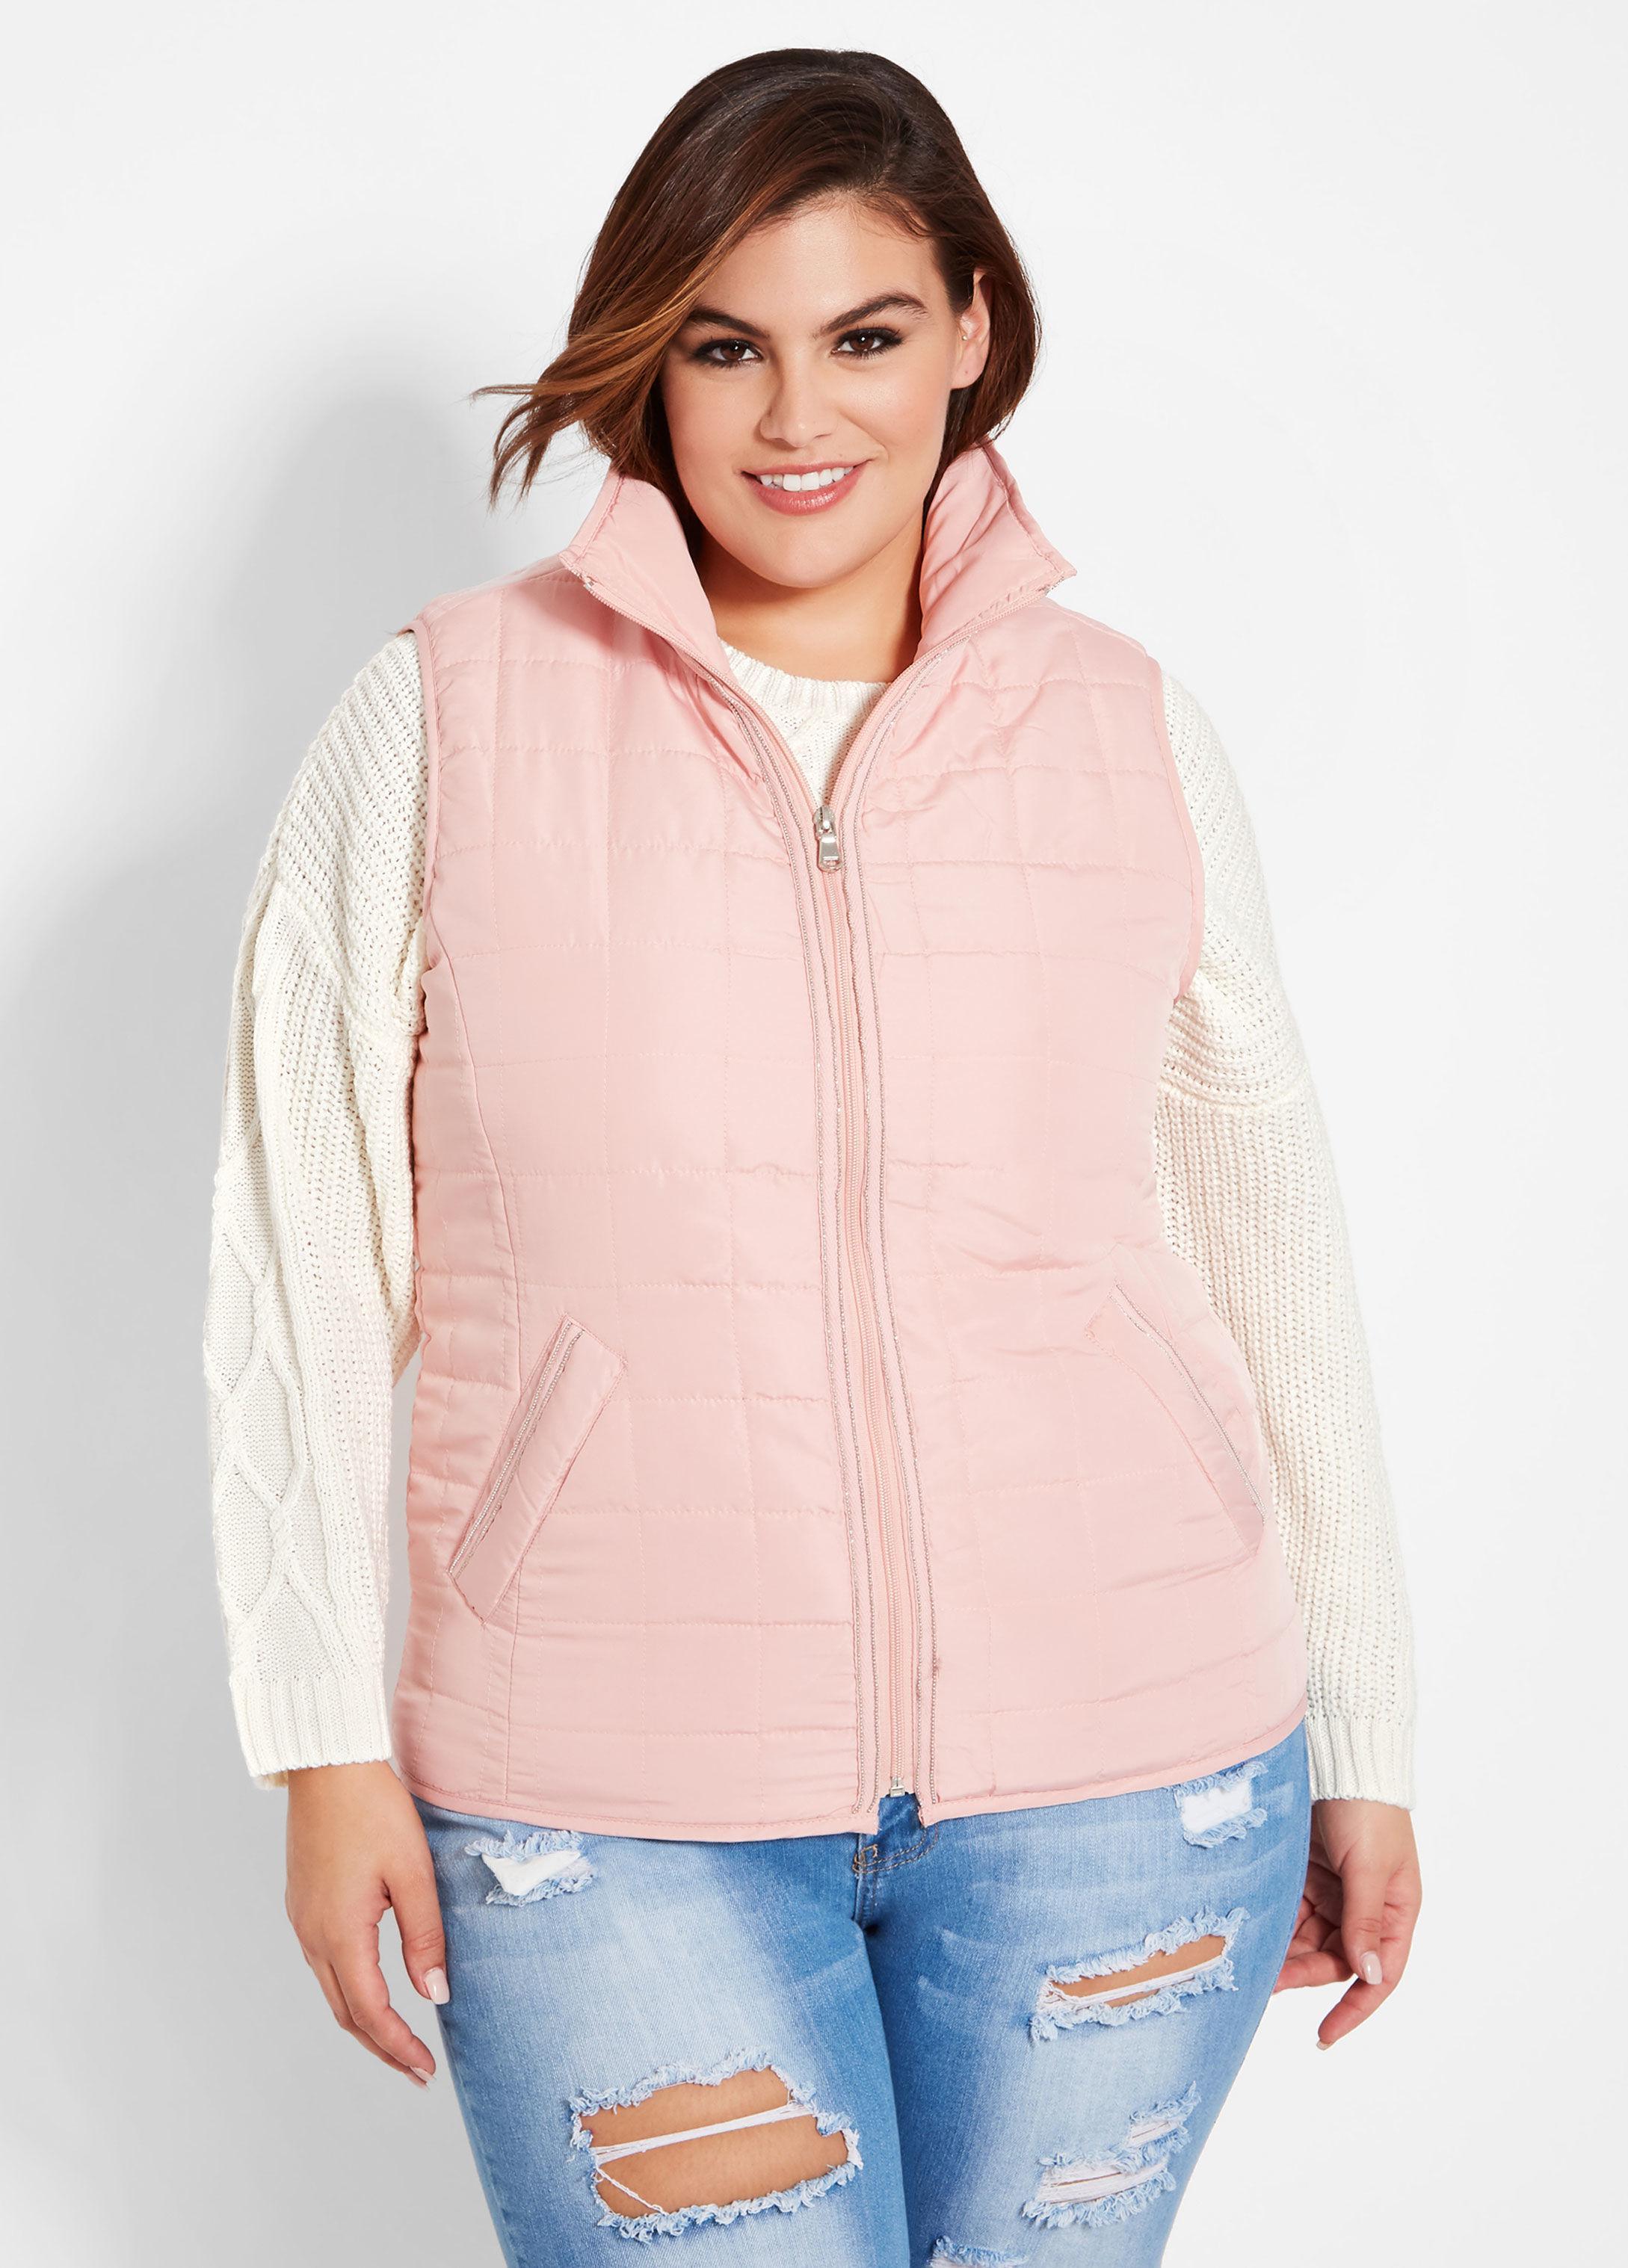 076b95f6199 Lyst - Ashley Stewart Plus Size Metallic Trim Puffer Vest in Pink